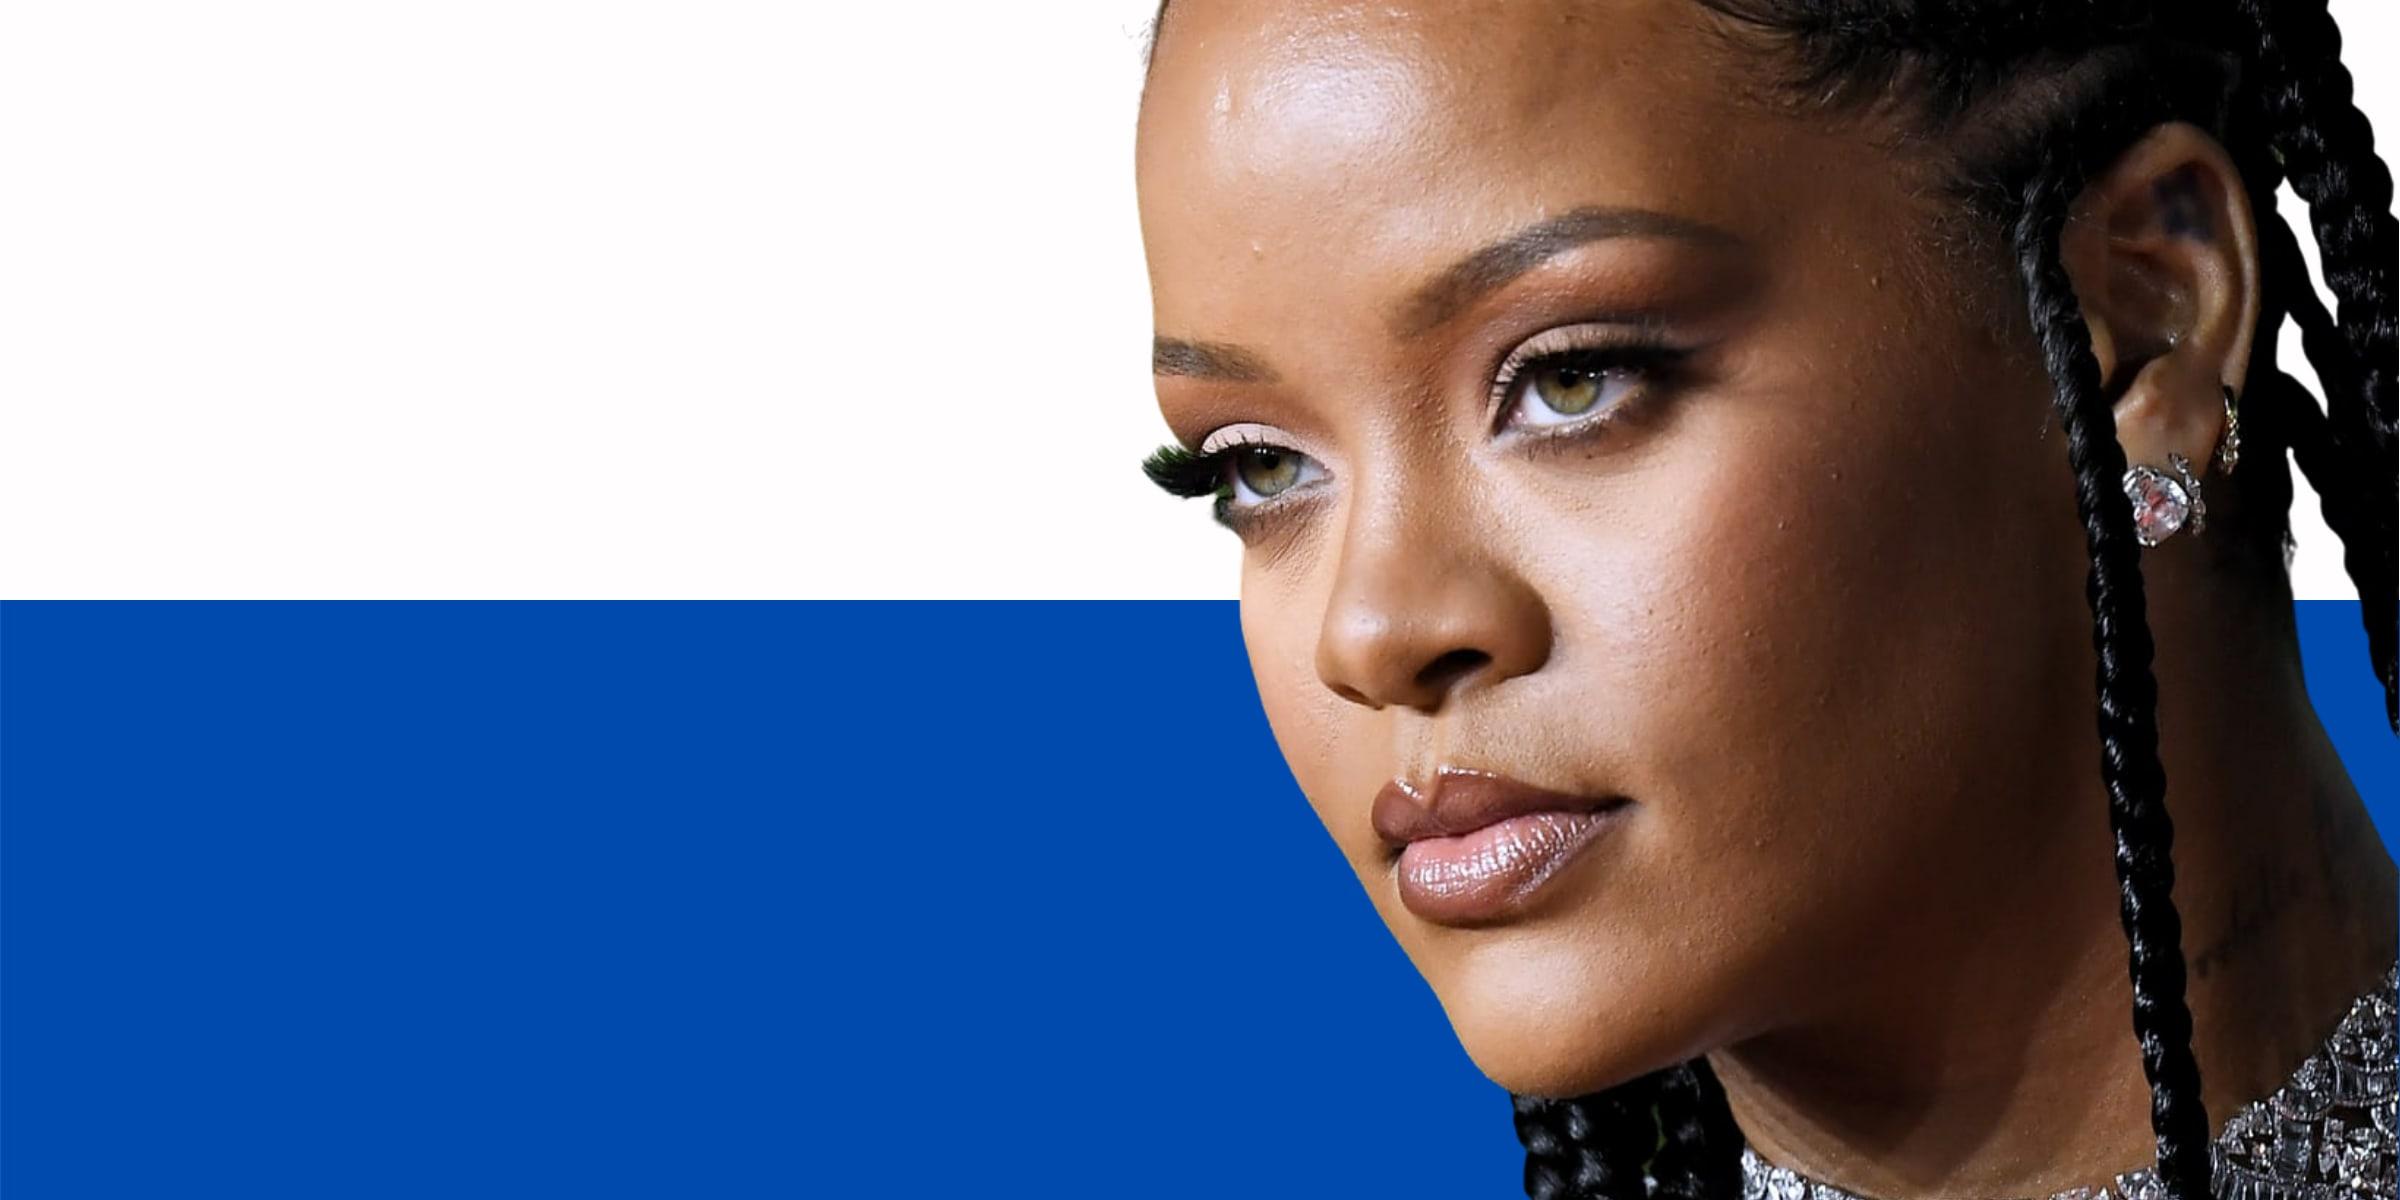 the love that Rihanna has